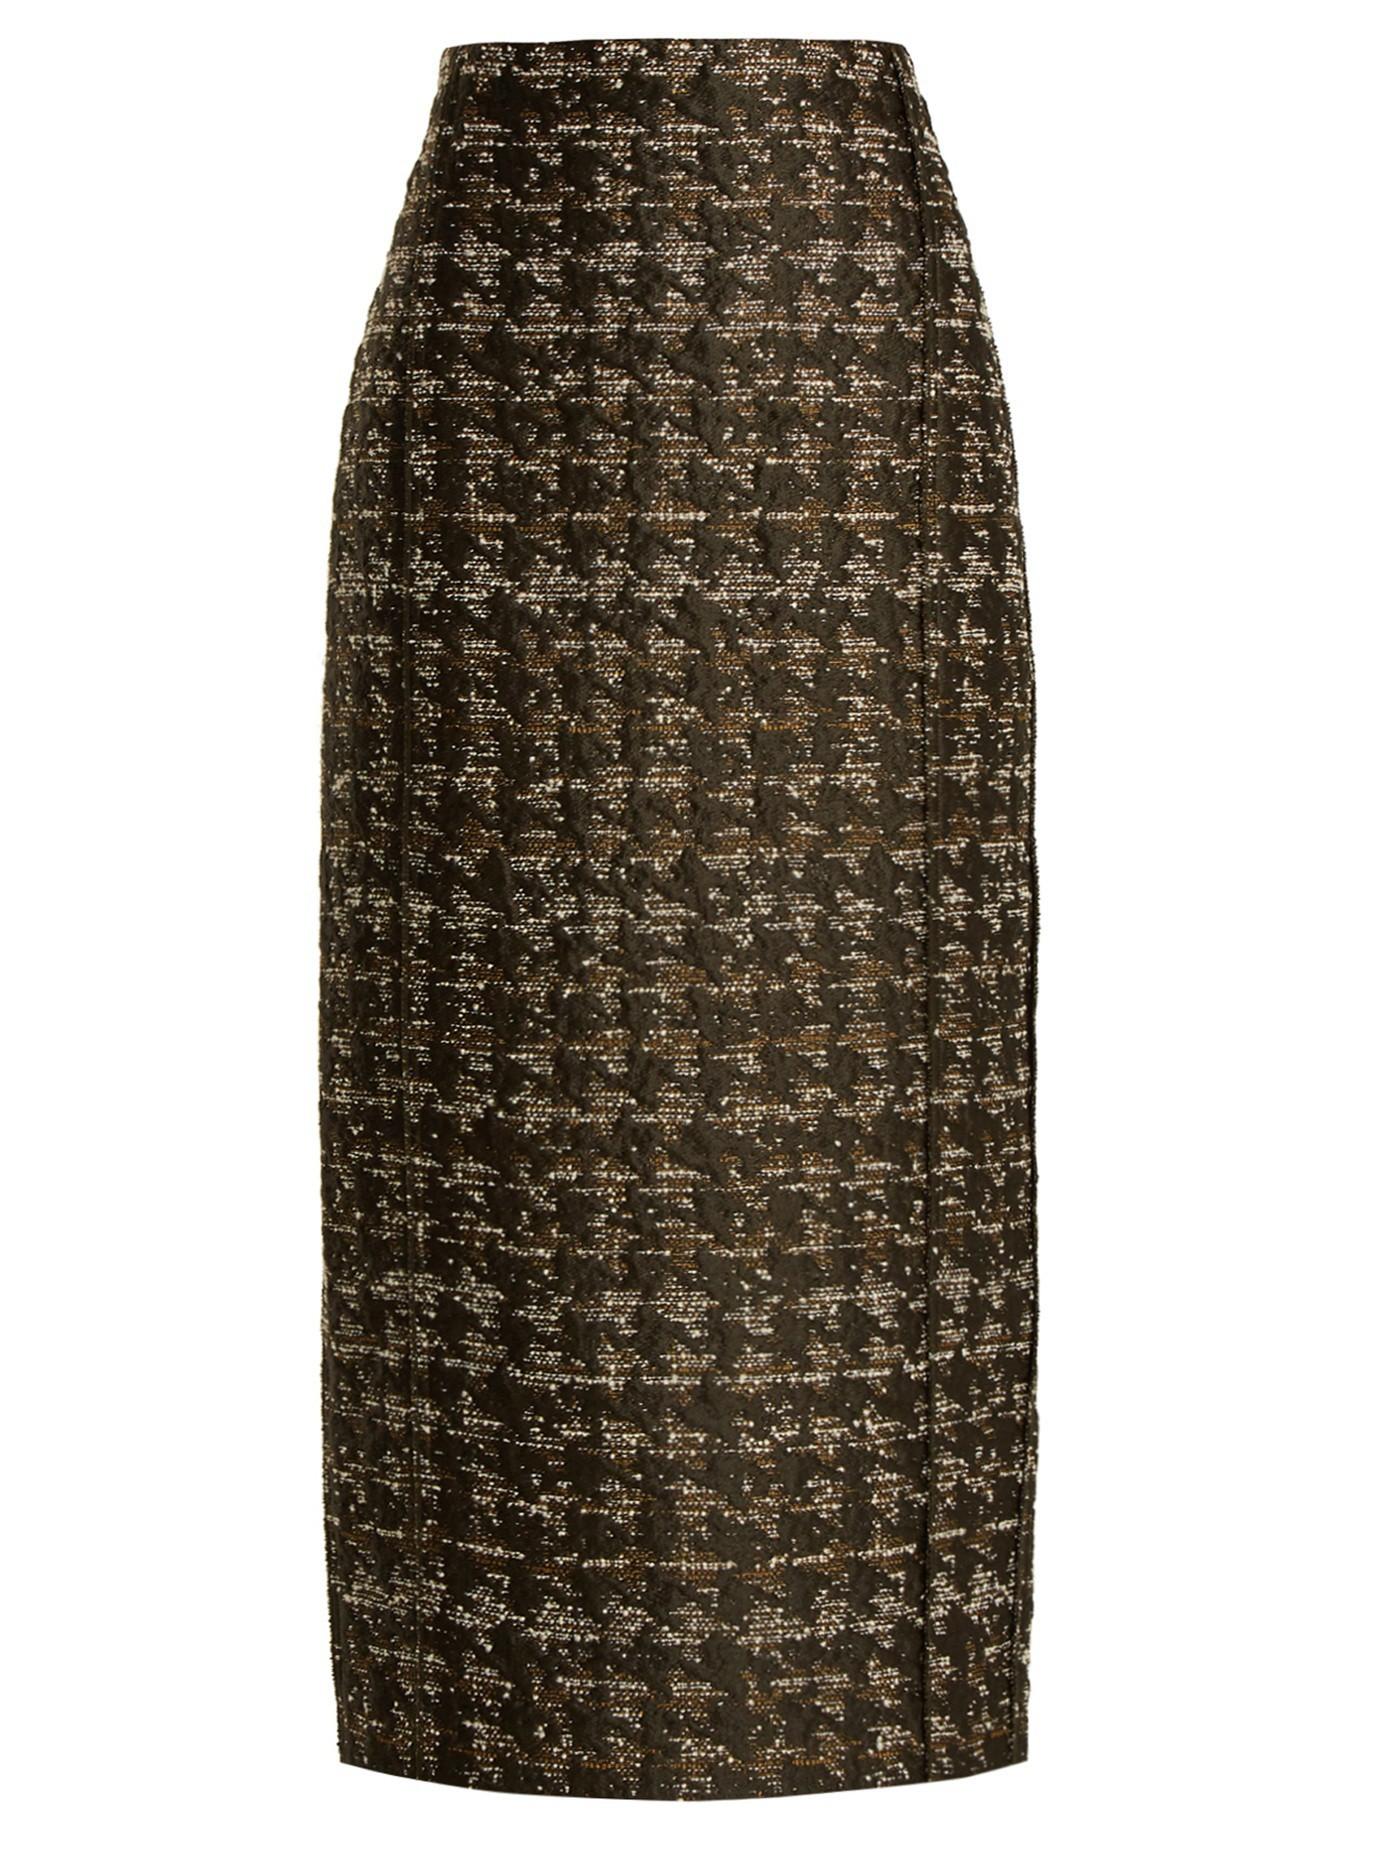 Levi Vintage Shorts Womens High Waisted Levis 501 Jean 6 8 10 12 14 16   eBay